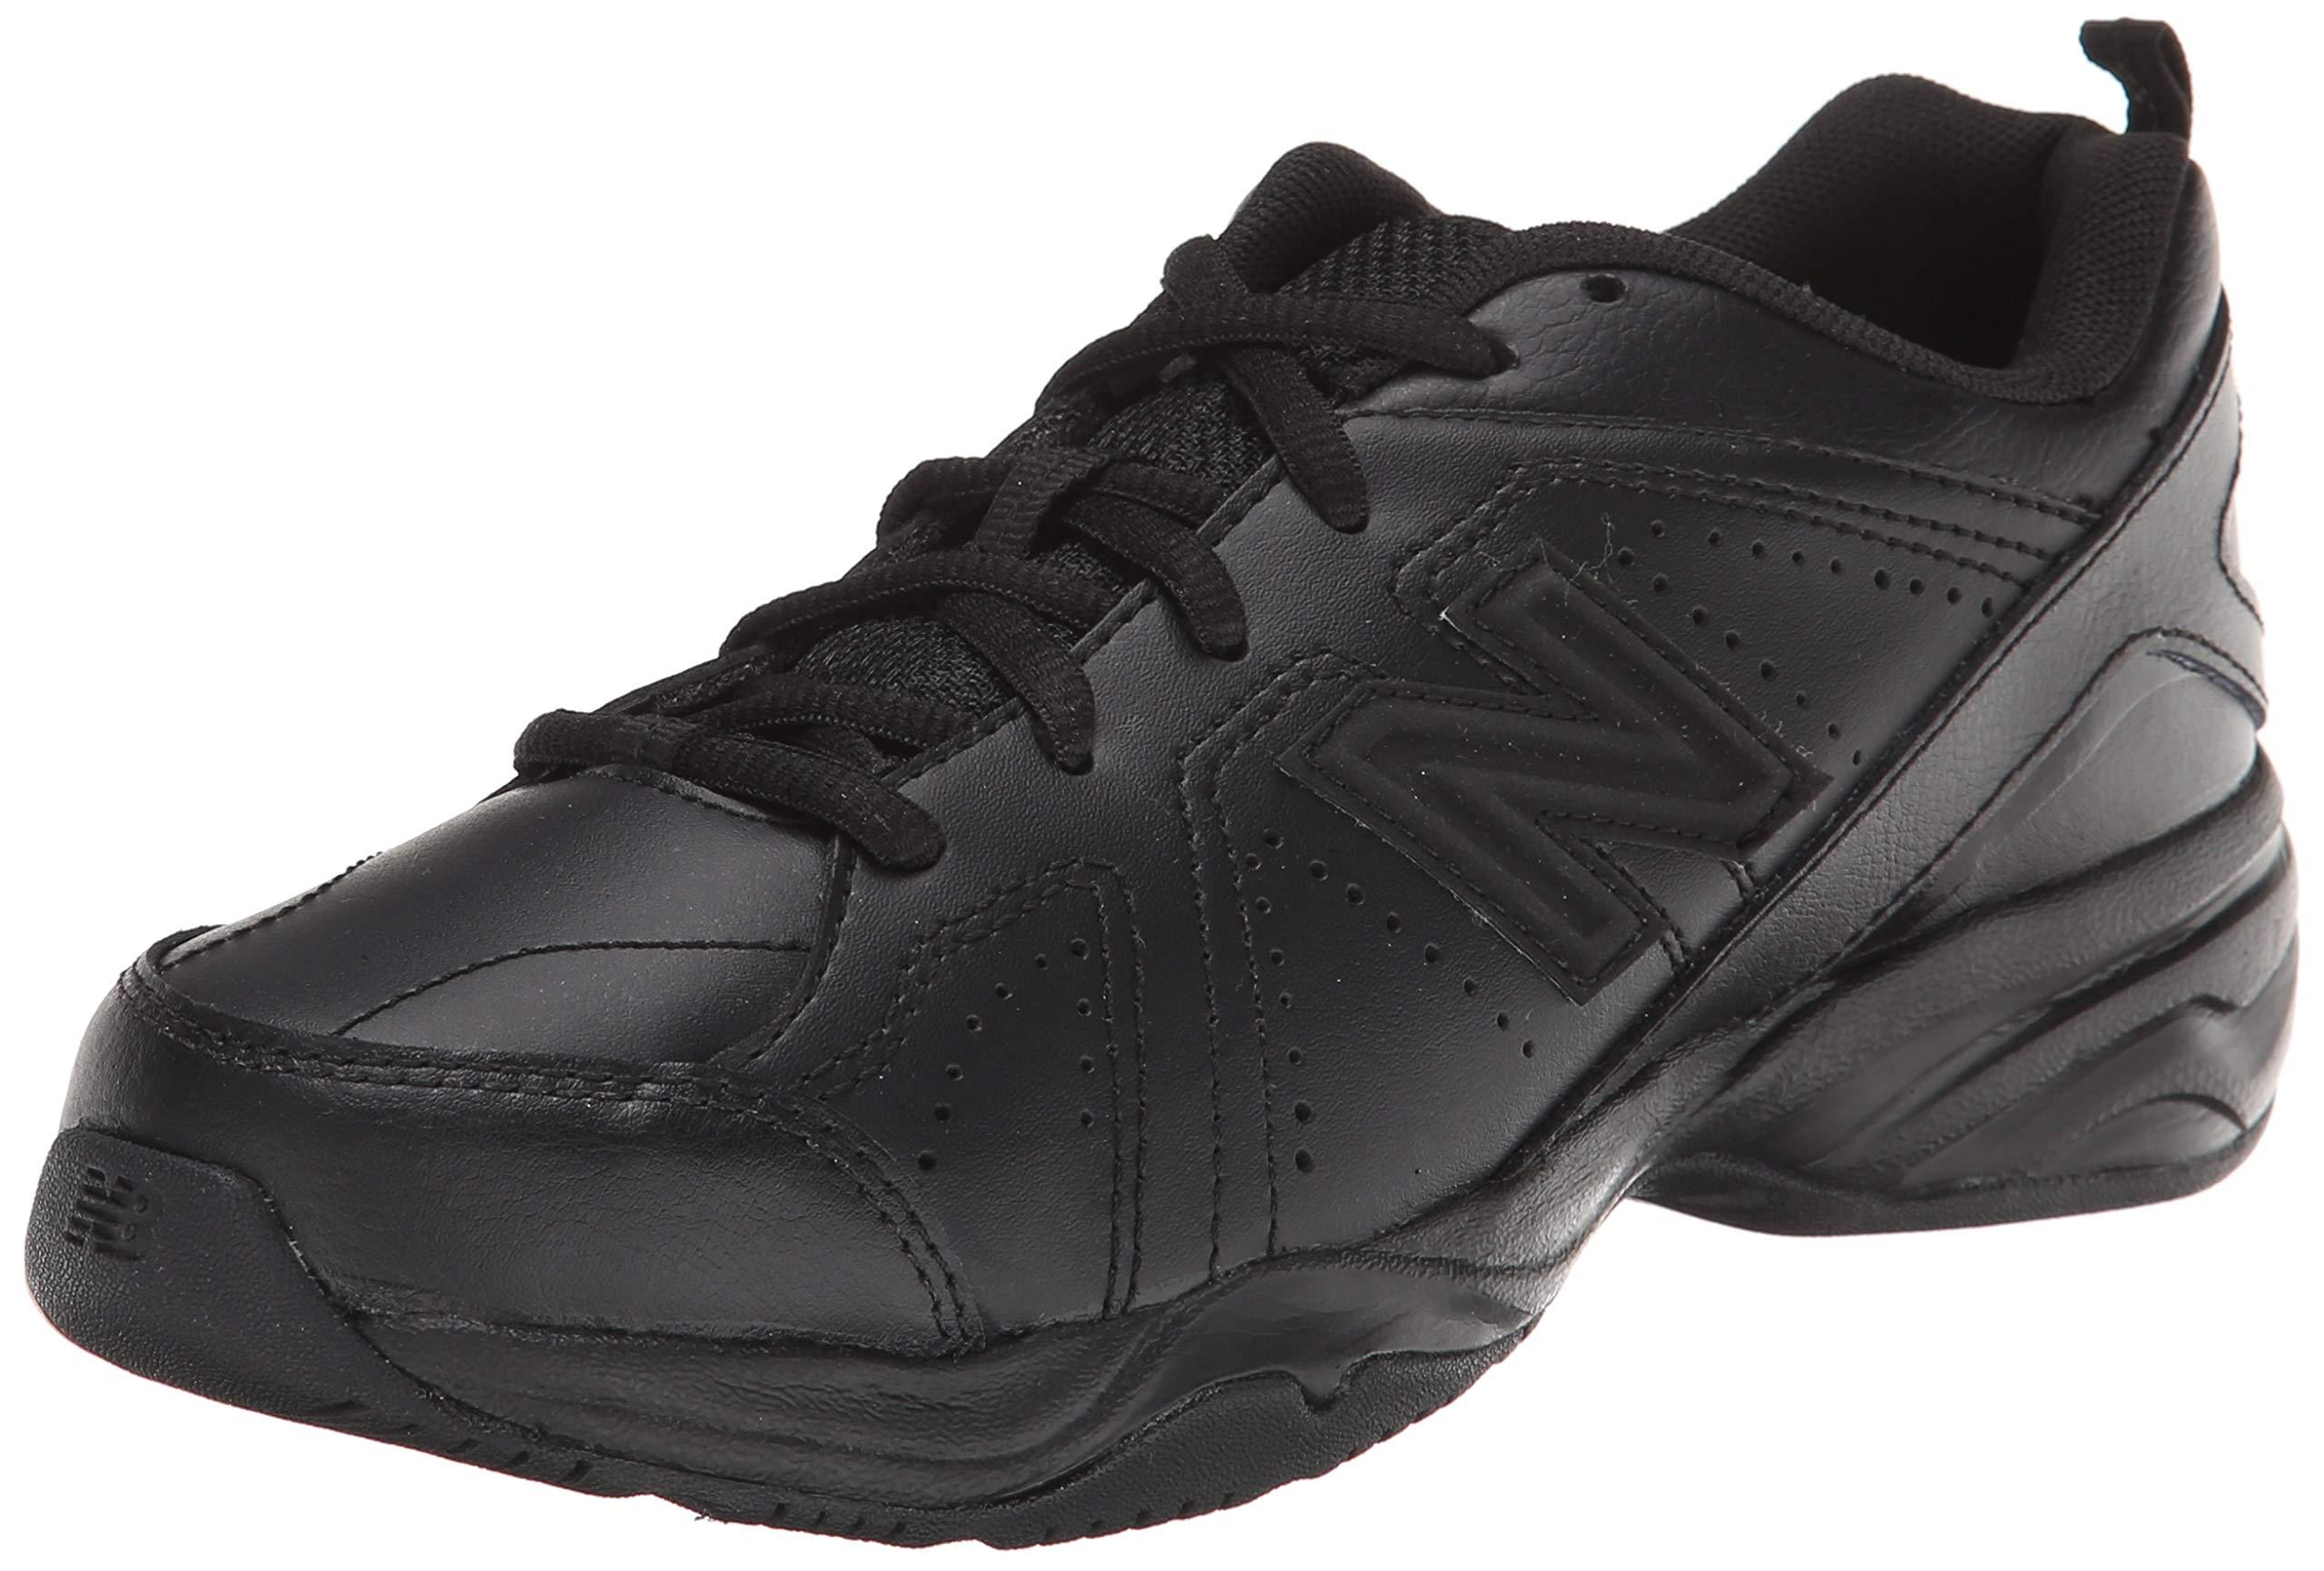 New Balance Boys KX624 Lace-Up Training Shoe ,Black,7 W US Big Kid by New Balance (Image #1)